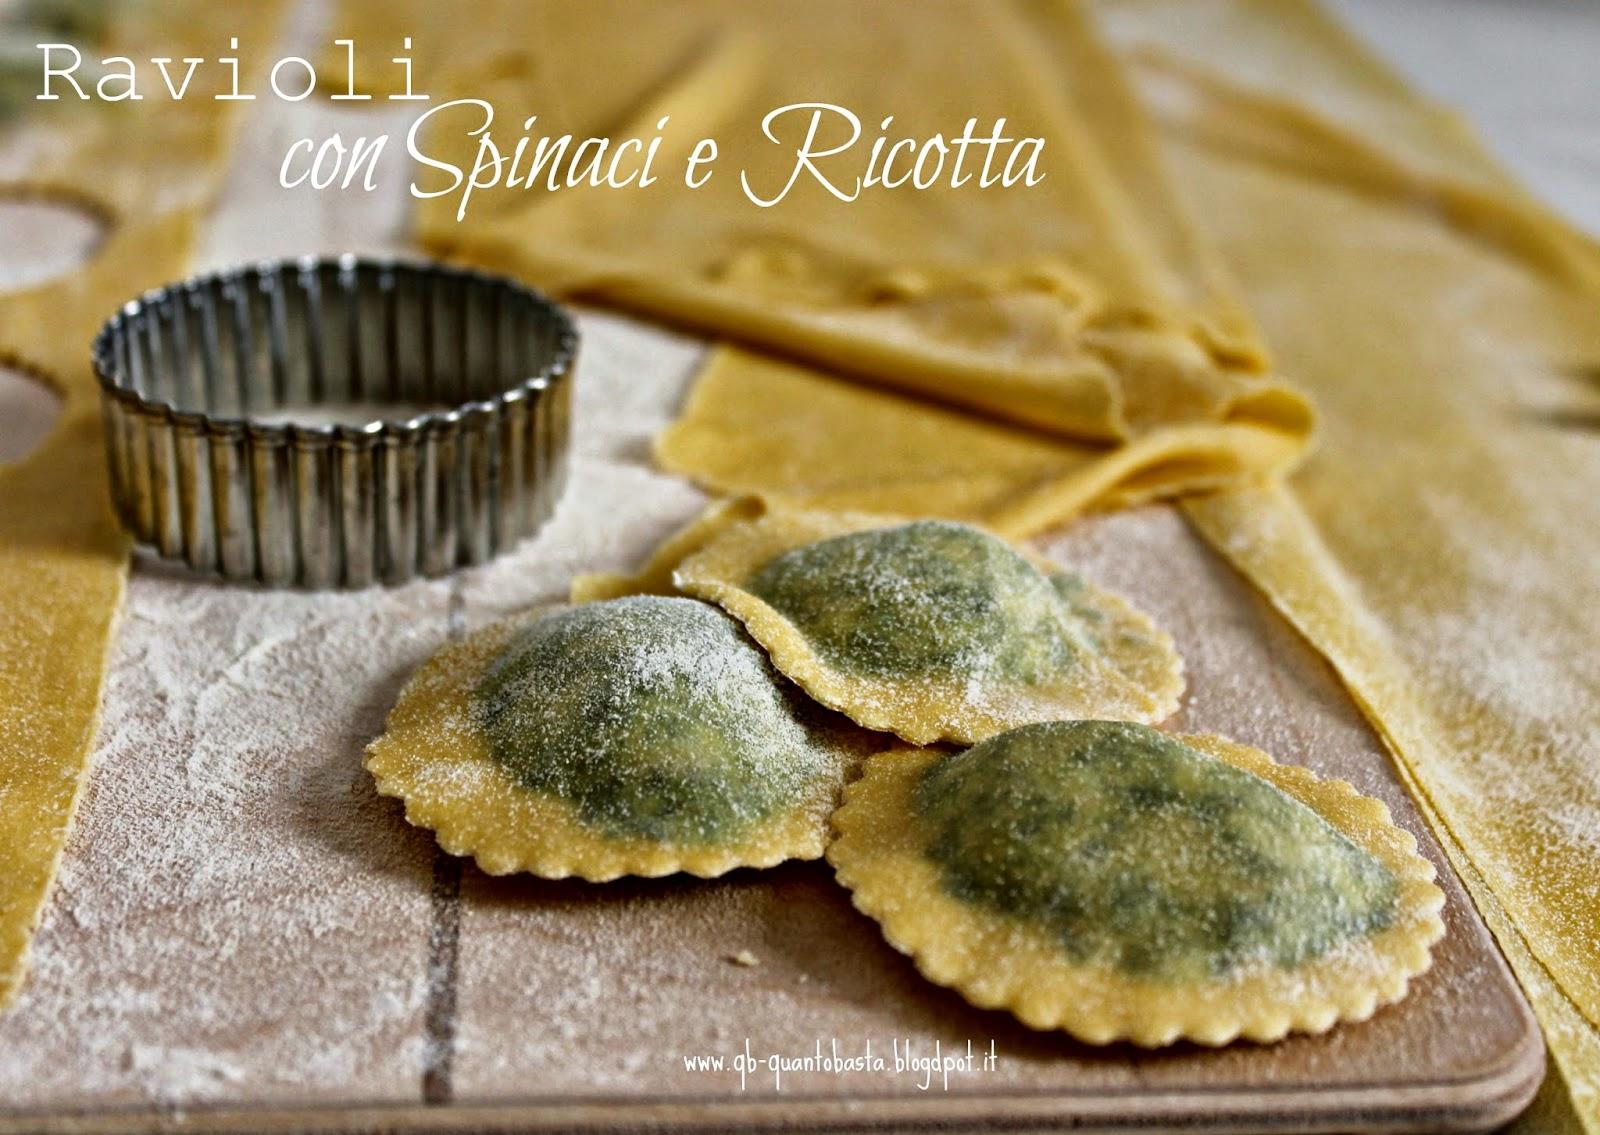 www.qb-quantobasta.blogspot.it - Pasta fresca ripiena